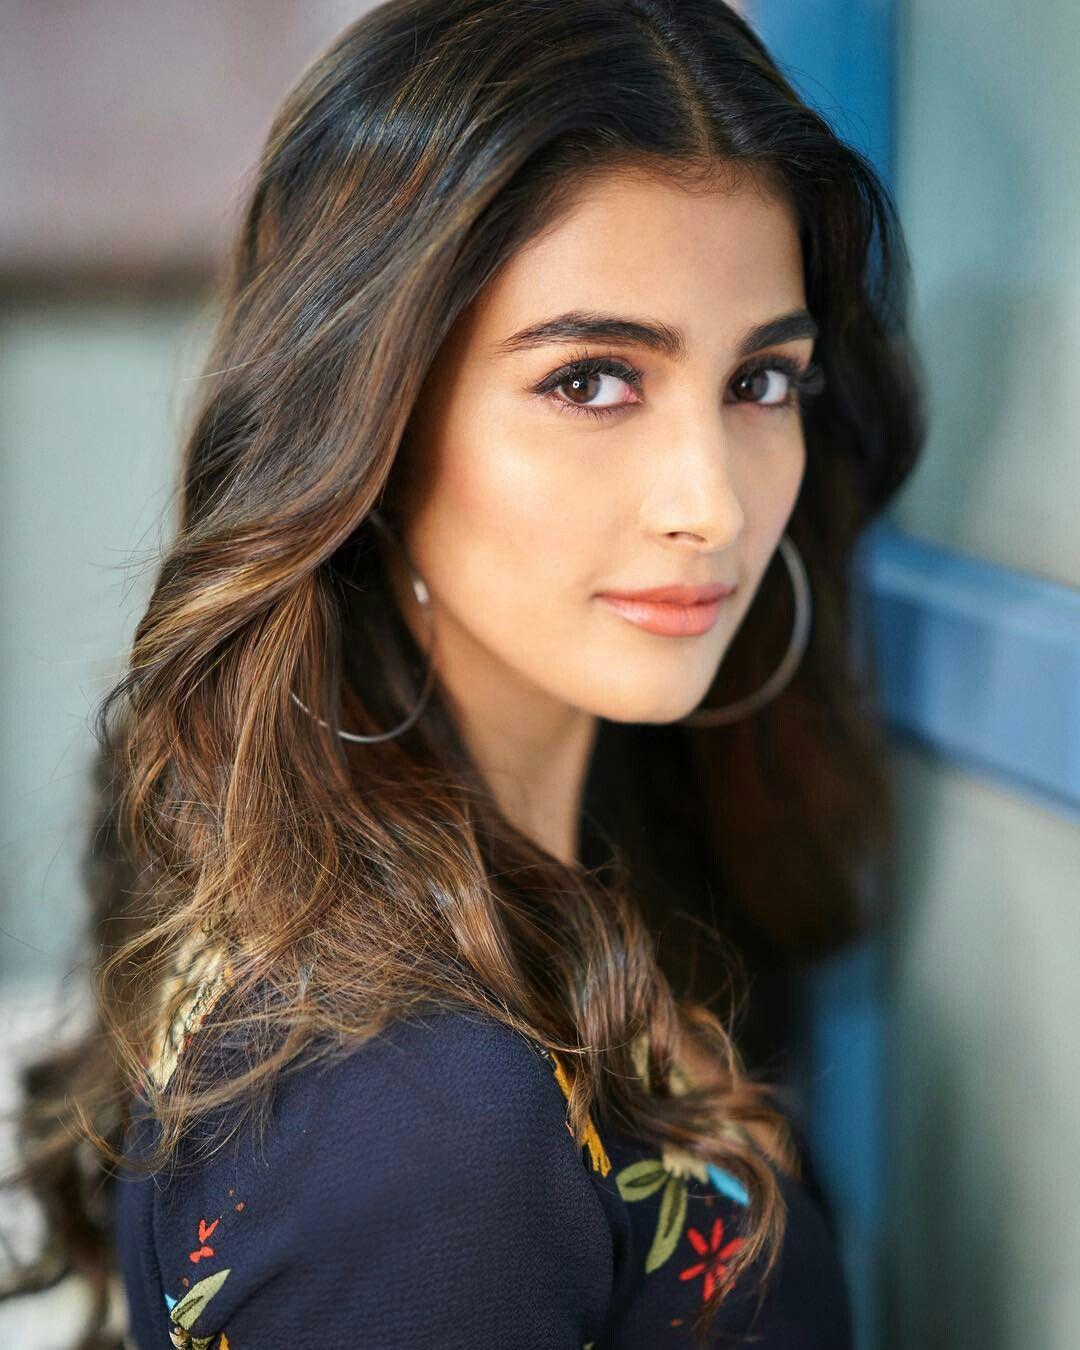 Pooja Hegde Heroines in 2019 Indian actresses Beautiful 1080x1350